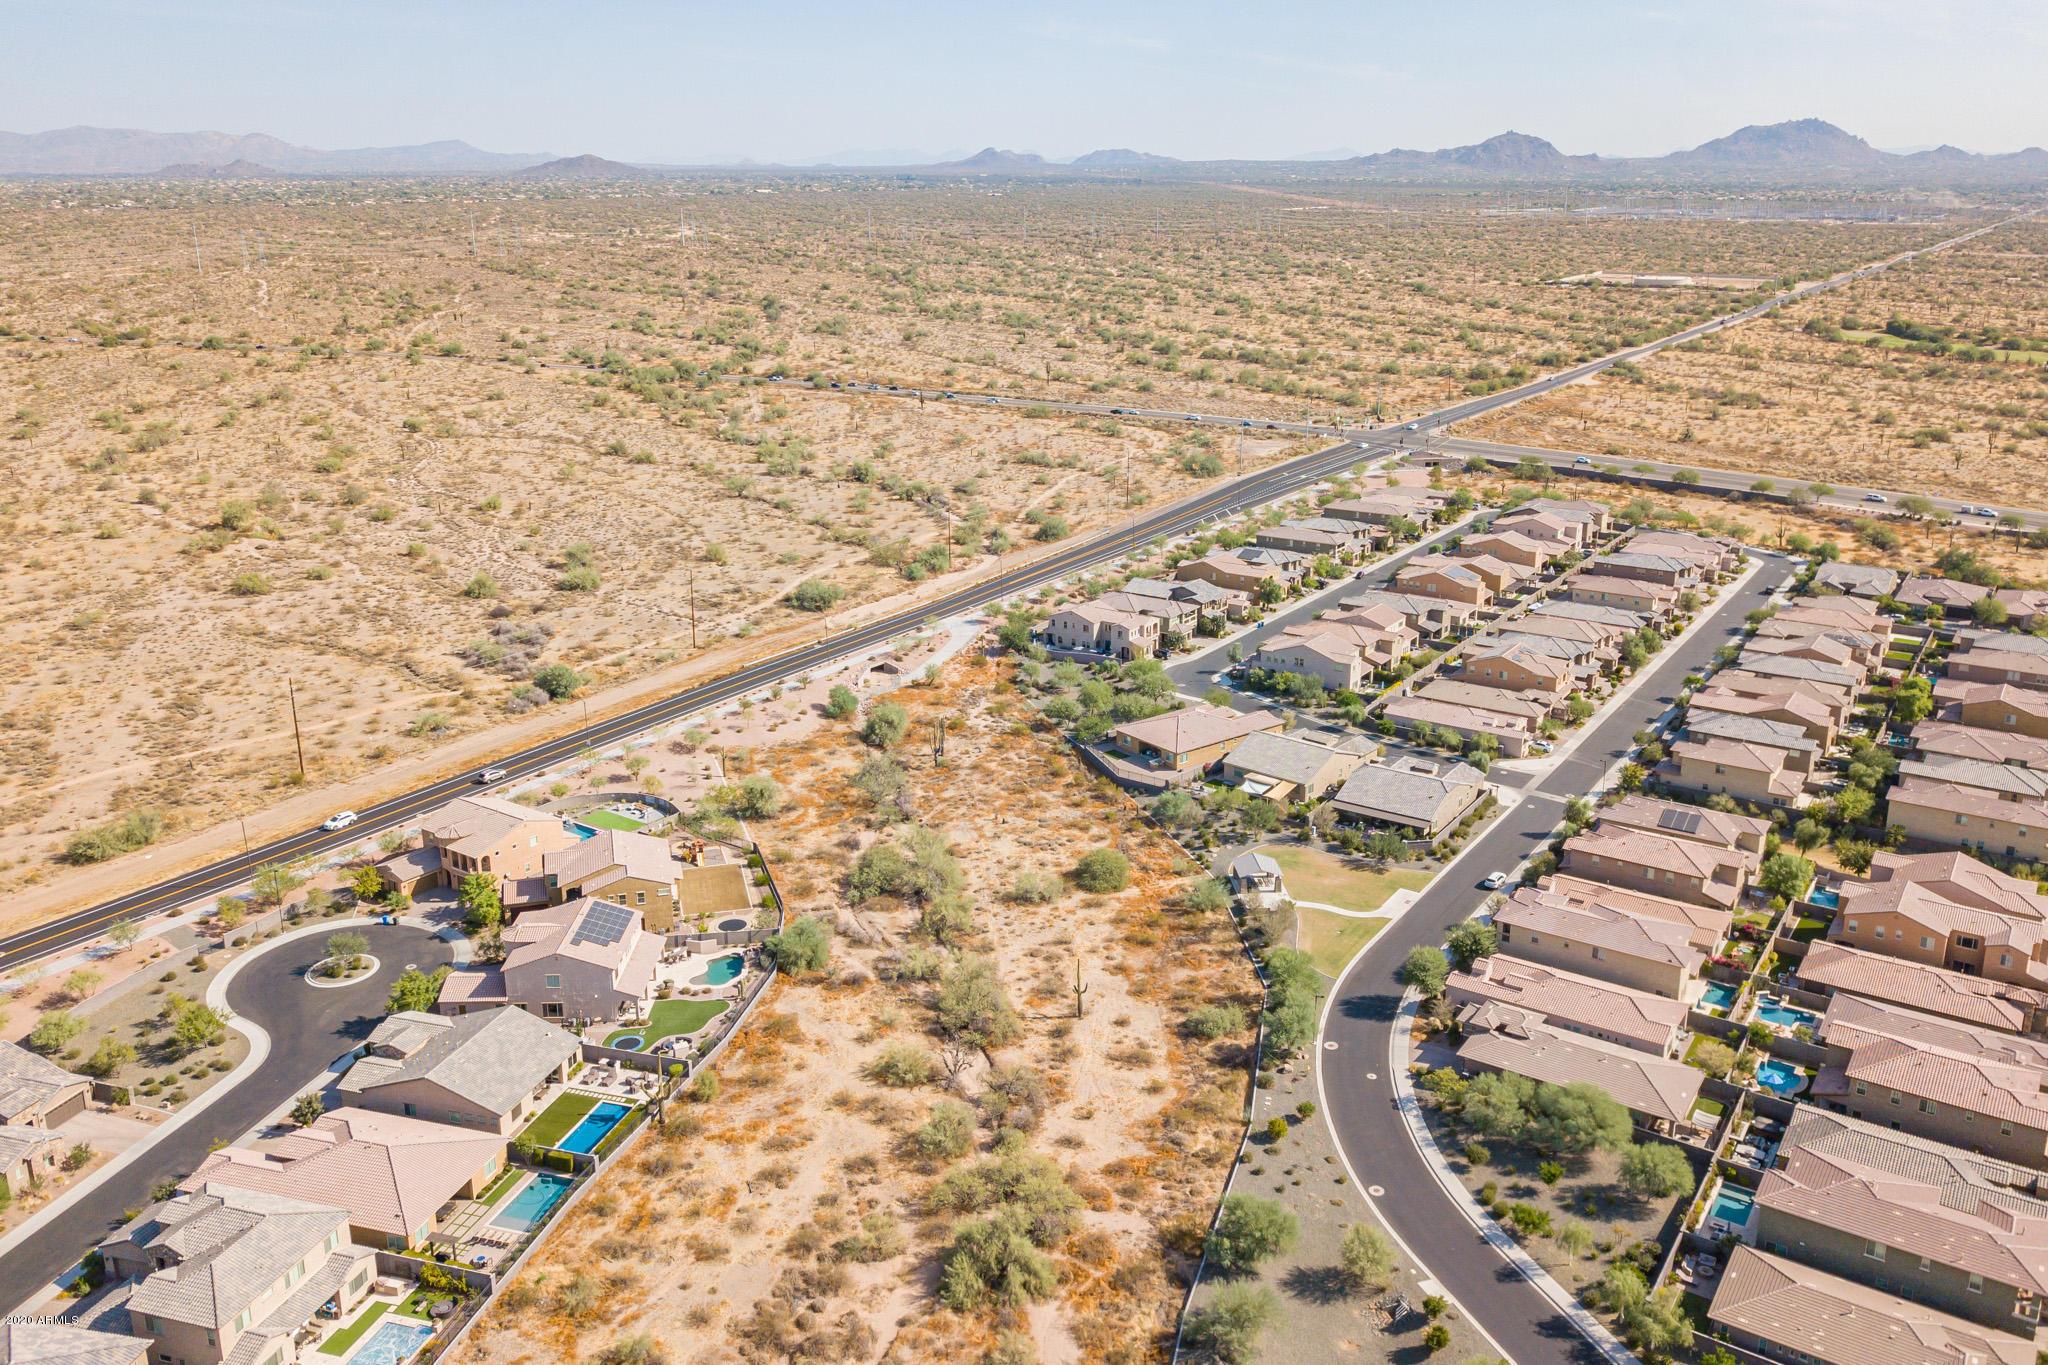 MLS 6147151 23111 N 44TH Place, Phoenix, AZ 85050 Phoenix AZ Desert View